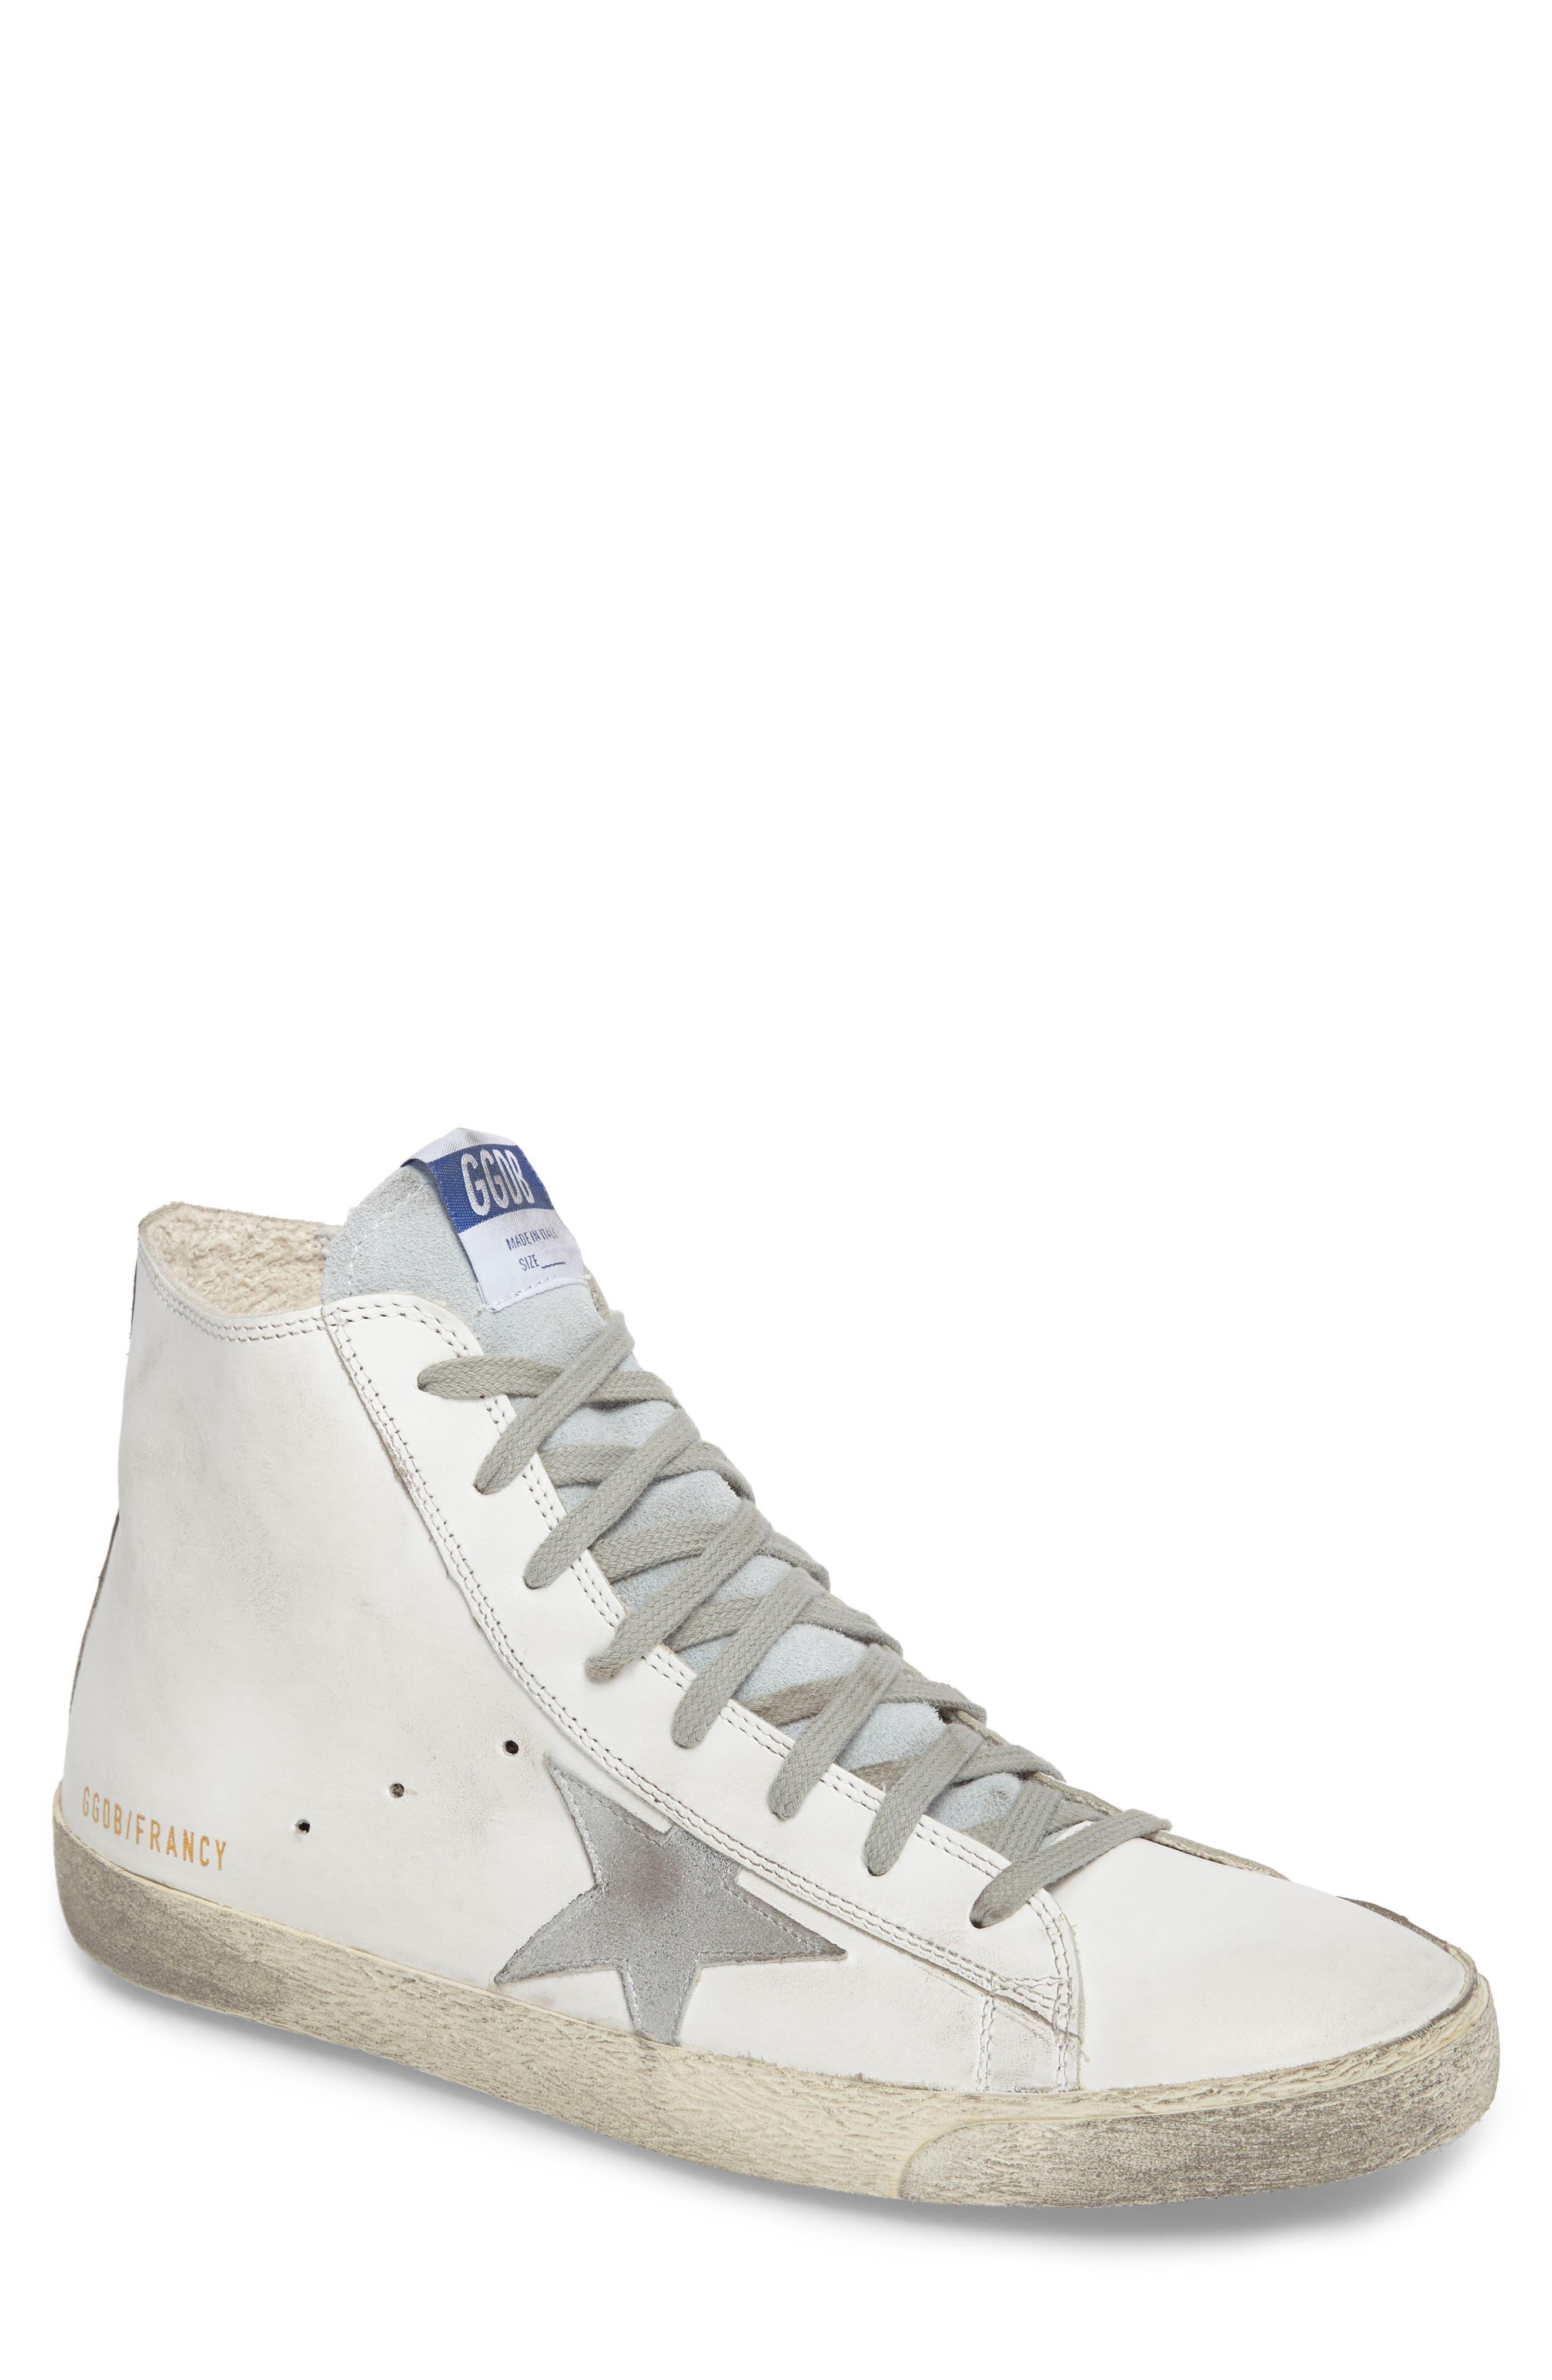 Francy High Top Sneaker,                             Main thumbnail 1, color,                             100